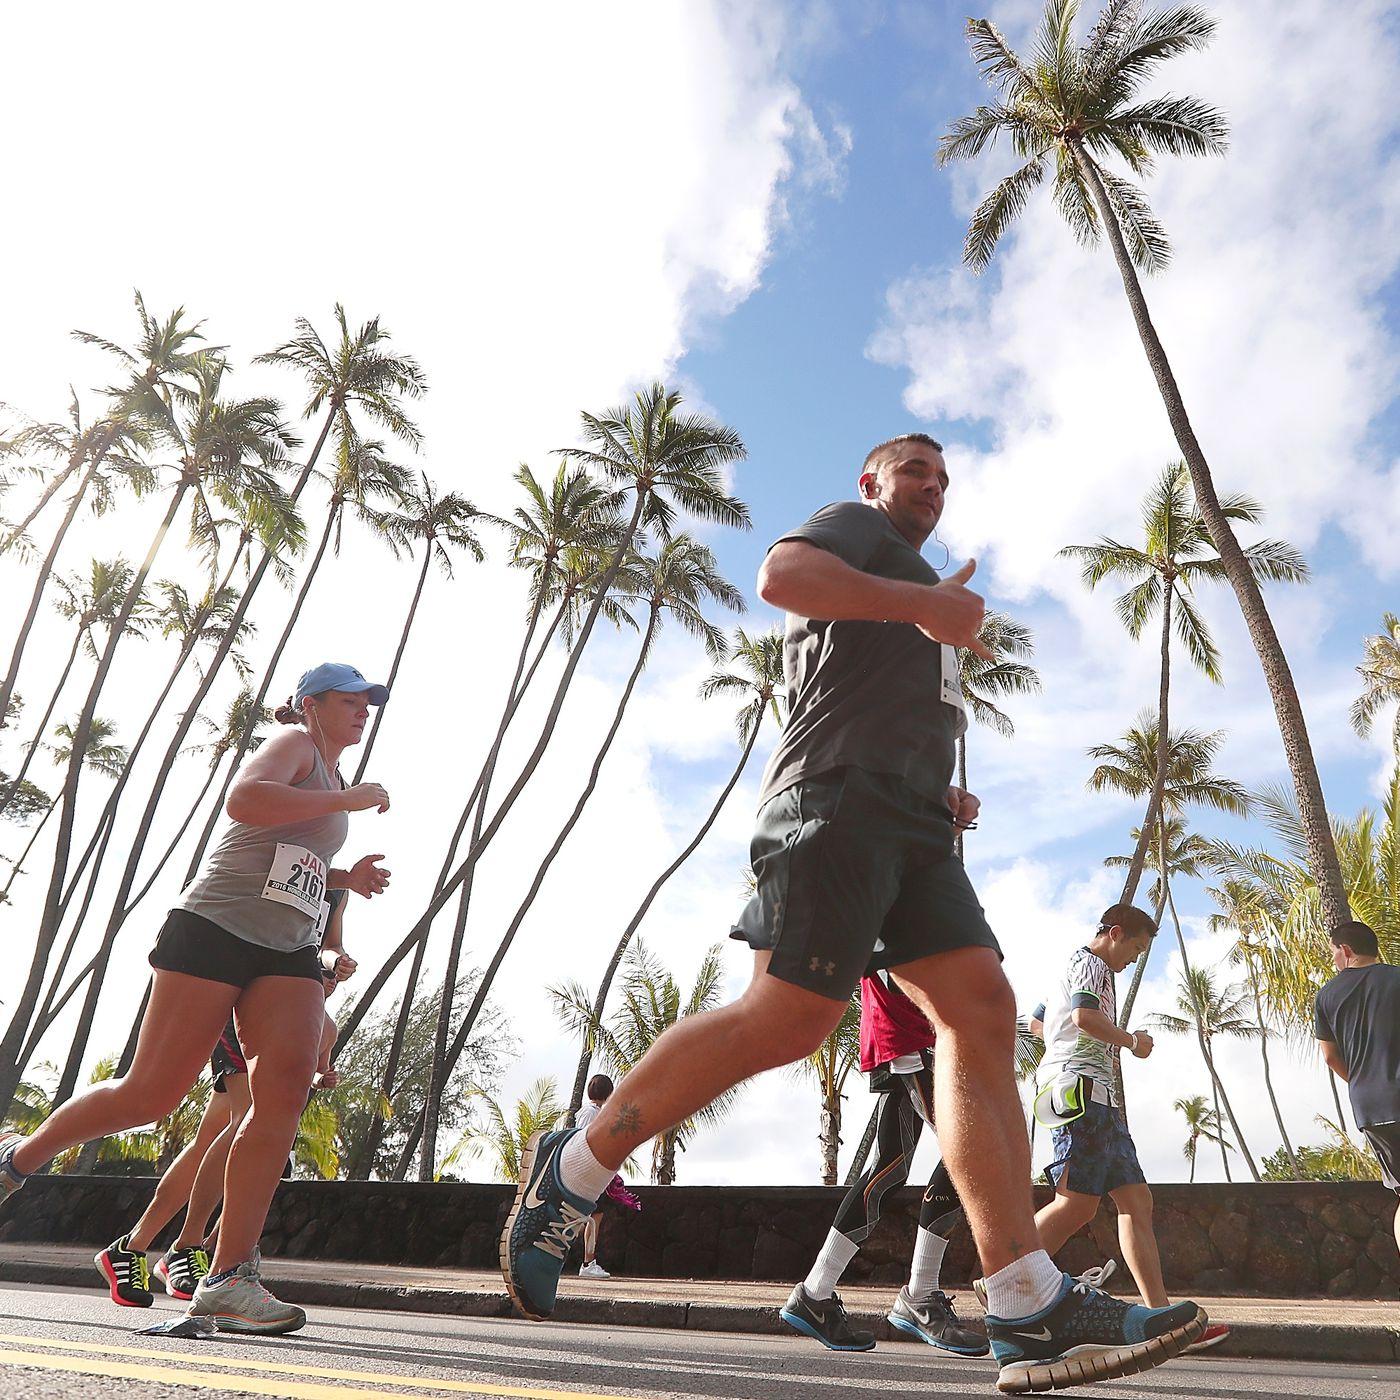 Full transcript: What fitness/running/activity/workout app